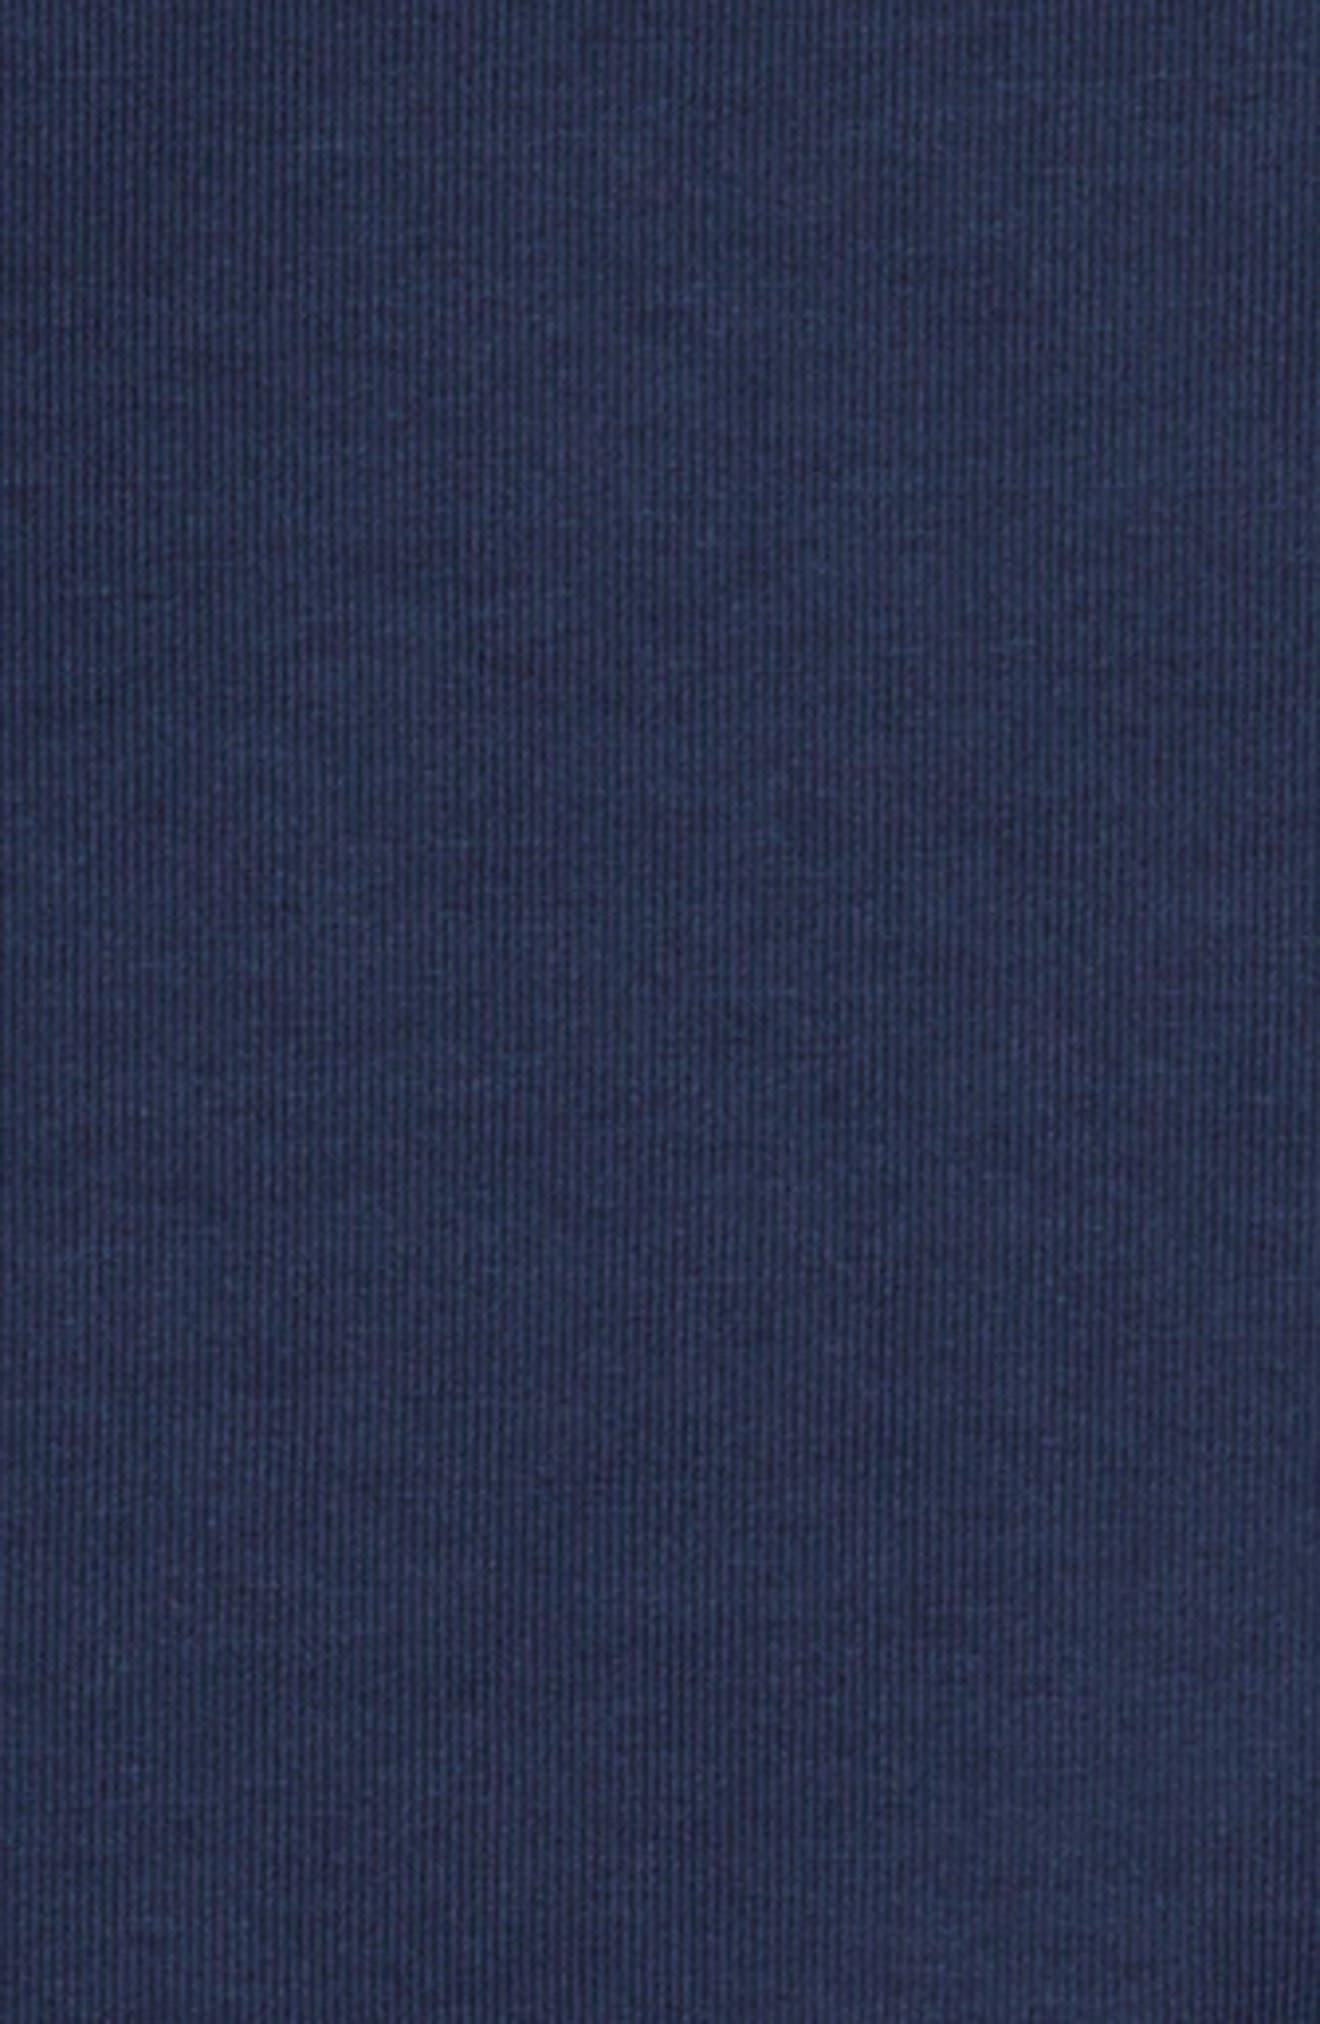 Alternate Image 2  - Nike Colorblock Raglan Logo Sweatshirt (Little Boys & Big Boys)